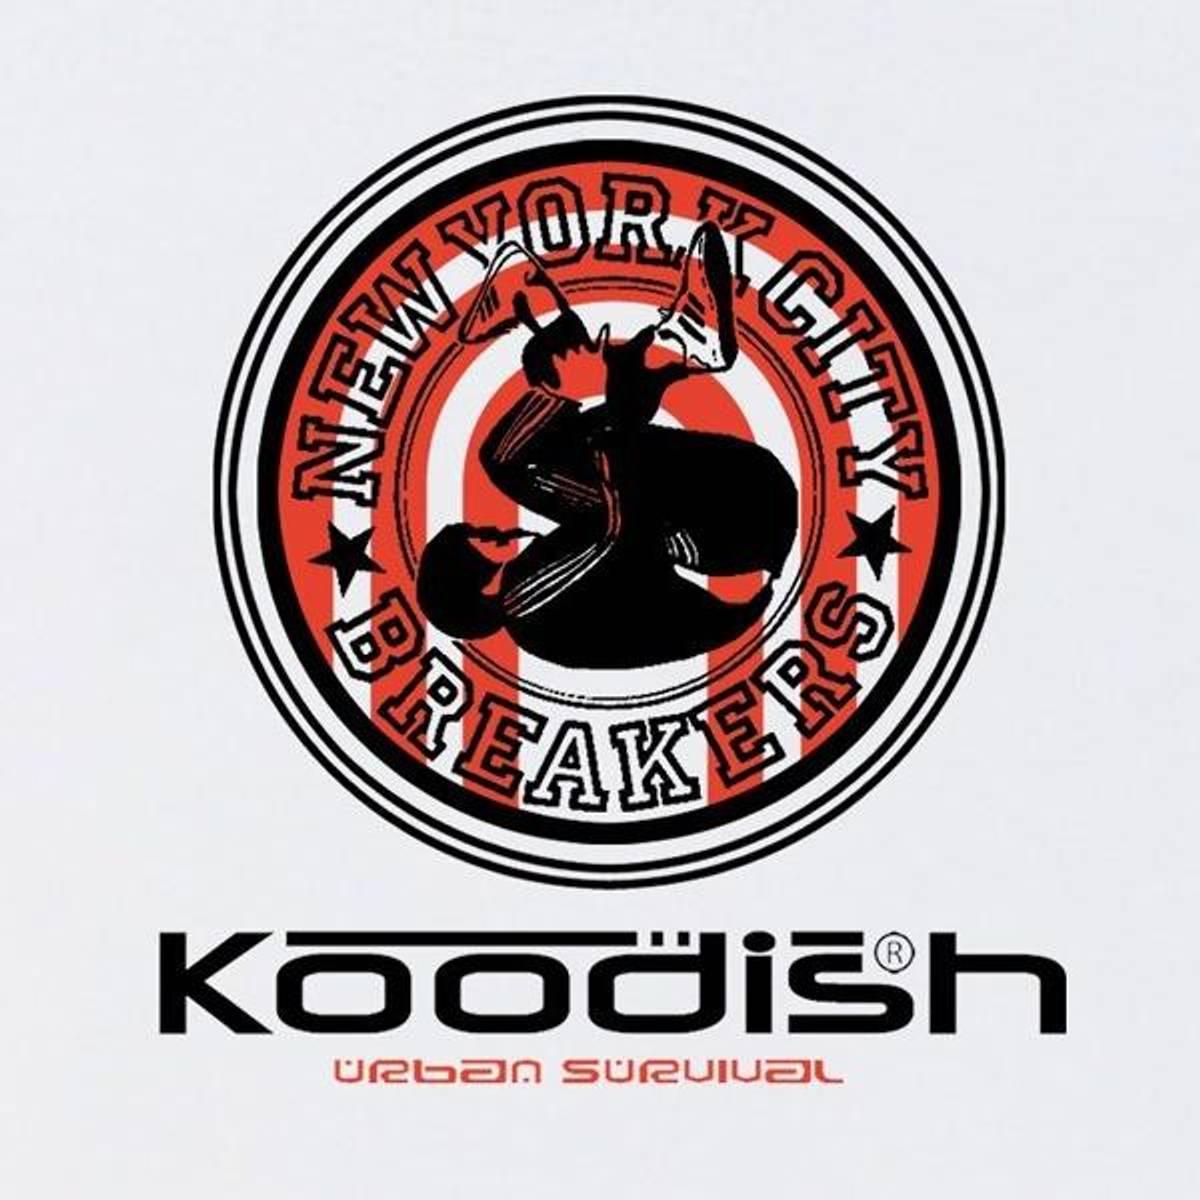 Koodish T-skjorte - NYC Breakers